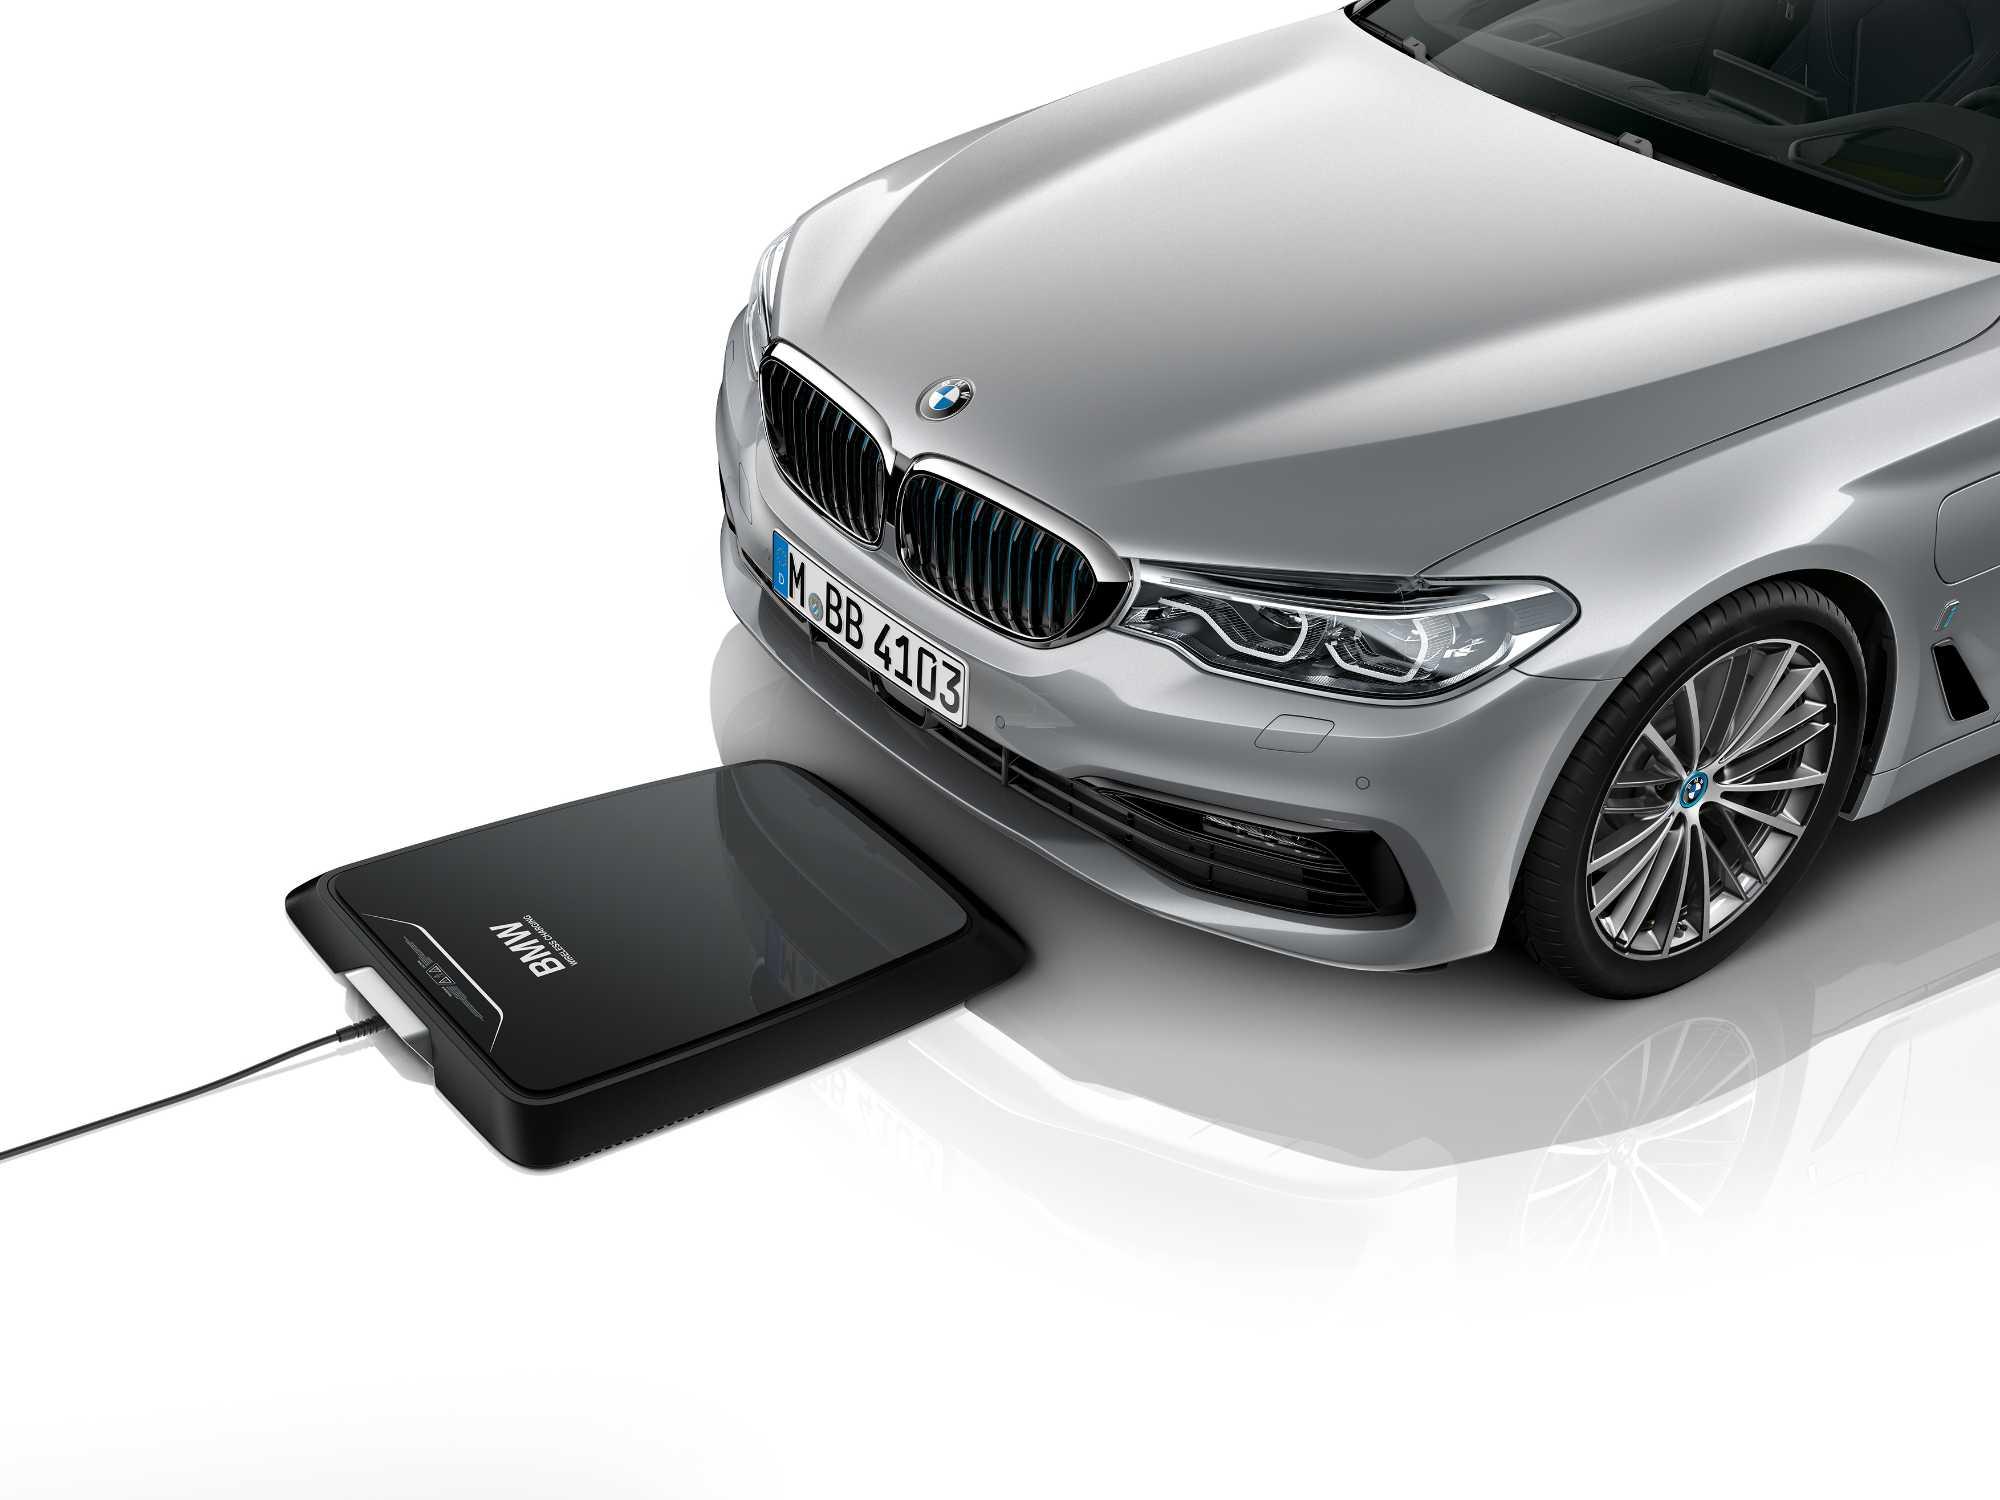 P90277538-bmw-wireless-charging-09-2017-2000px